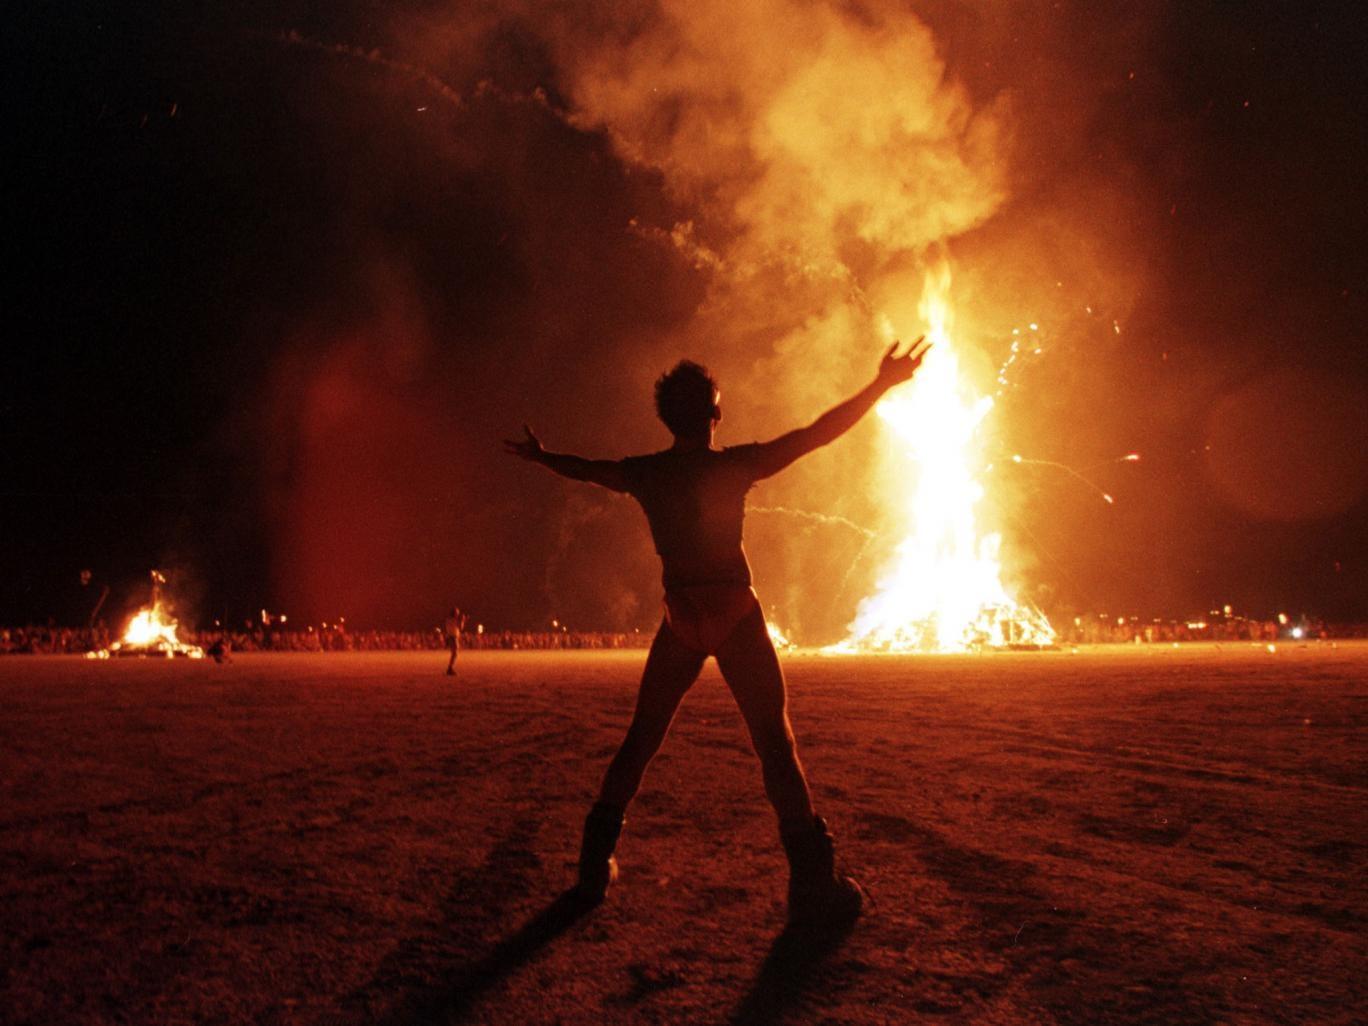 A festival-goer celebrates the end of Burning Man festival in Nevada